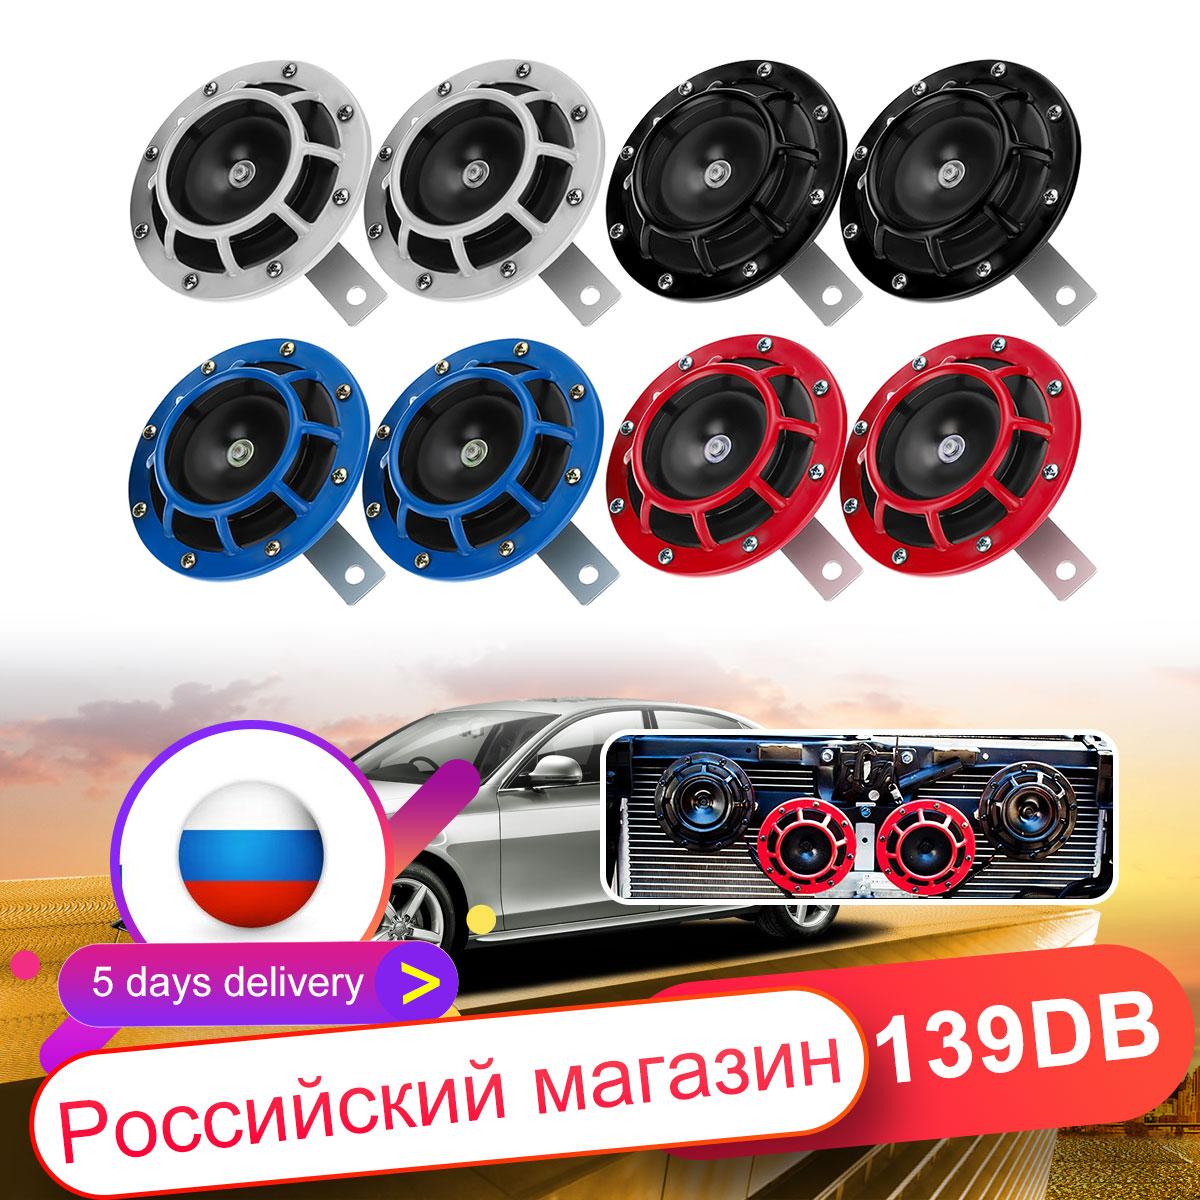 Universal Motorcycle Car Siren Dual Tone Electric Pump Loud Air Horn 12V 139db Off-road Super Loud Compact Electric Blast Tone